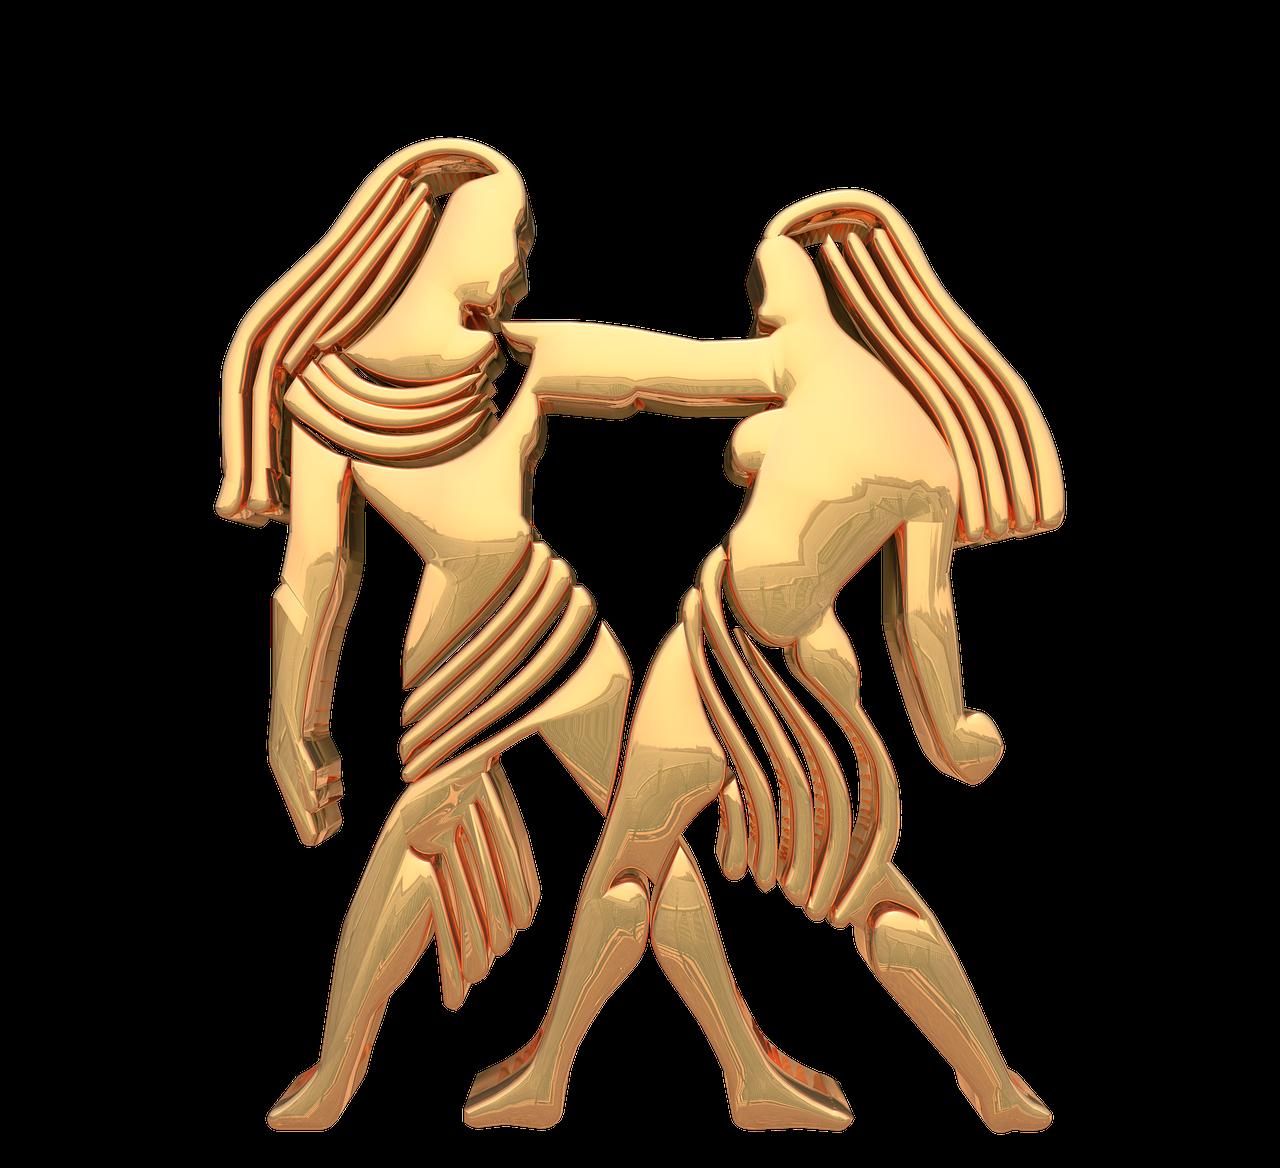 Love Happens Monthly Horoscopes - Gemini zodiac signs - astrology